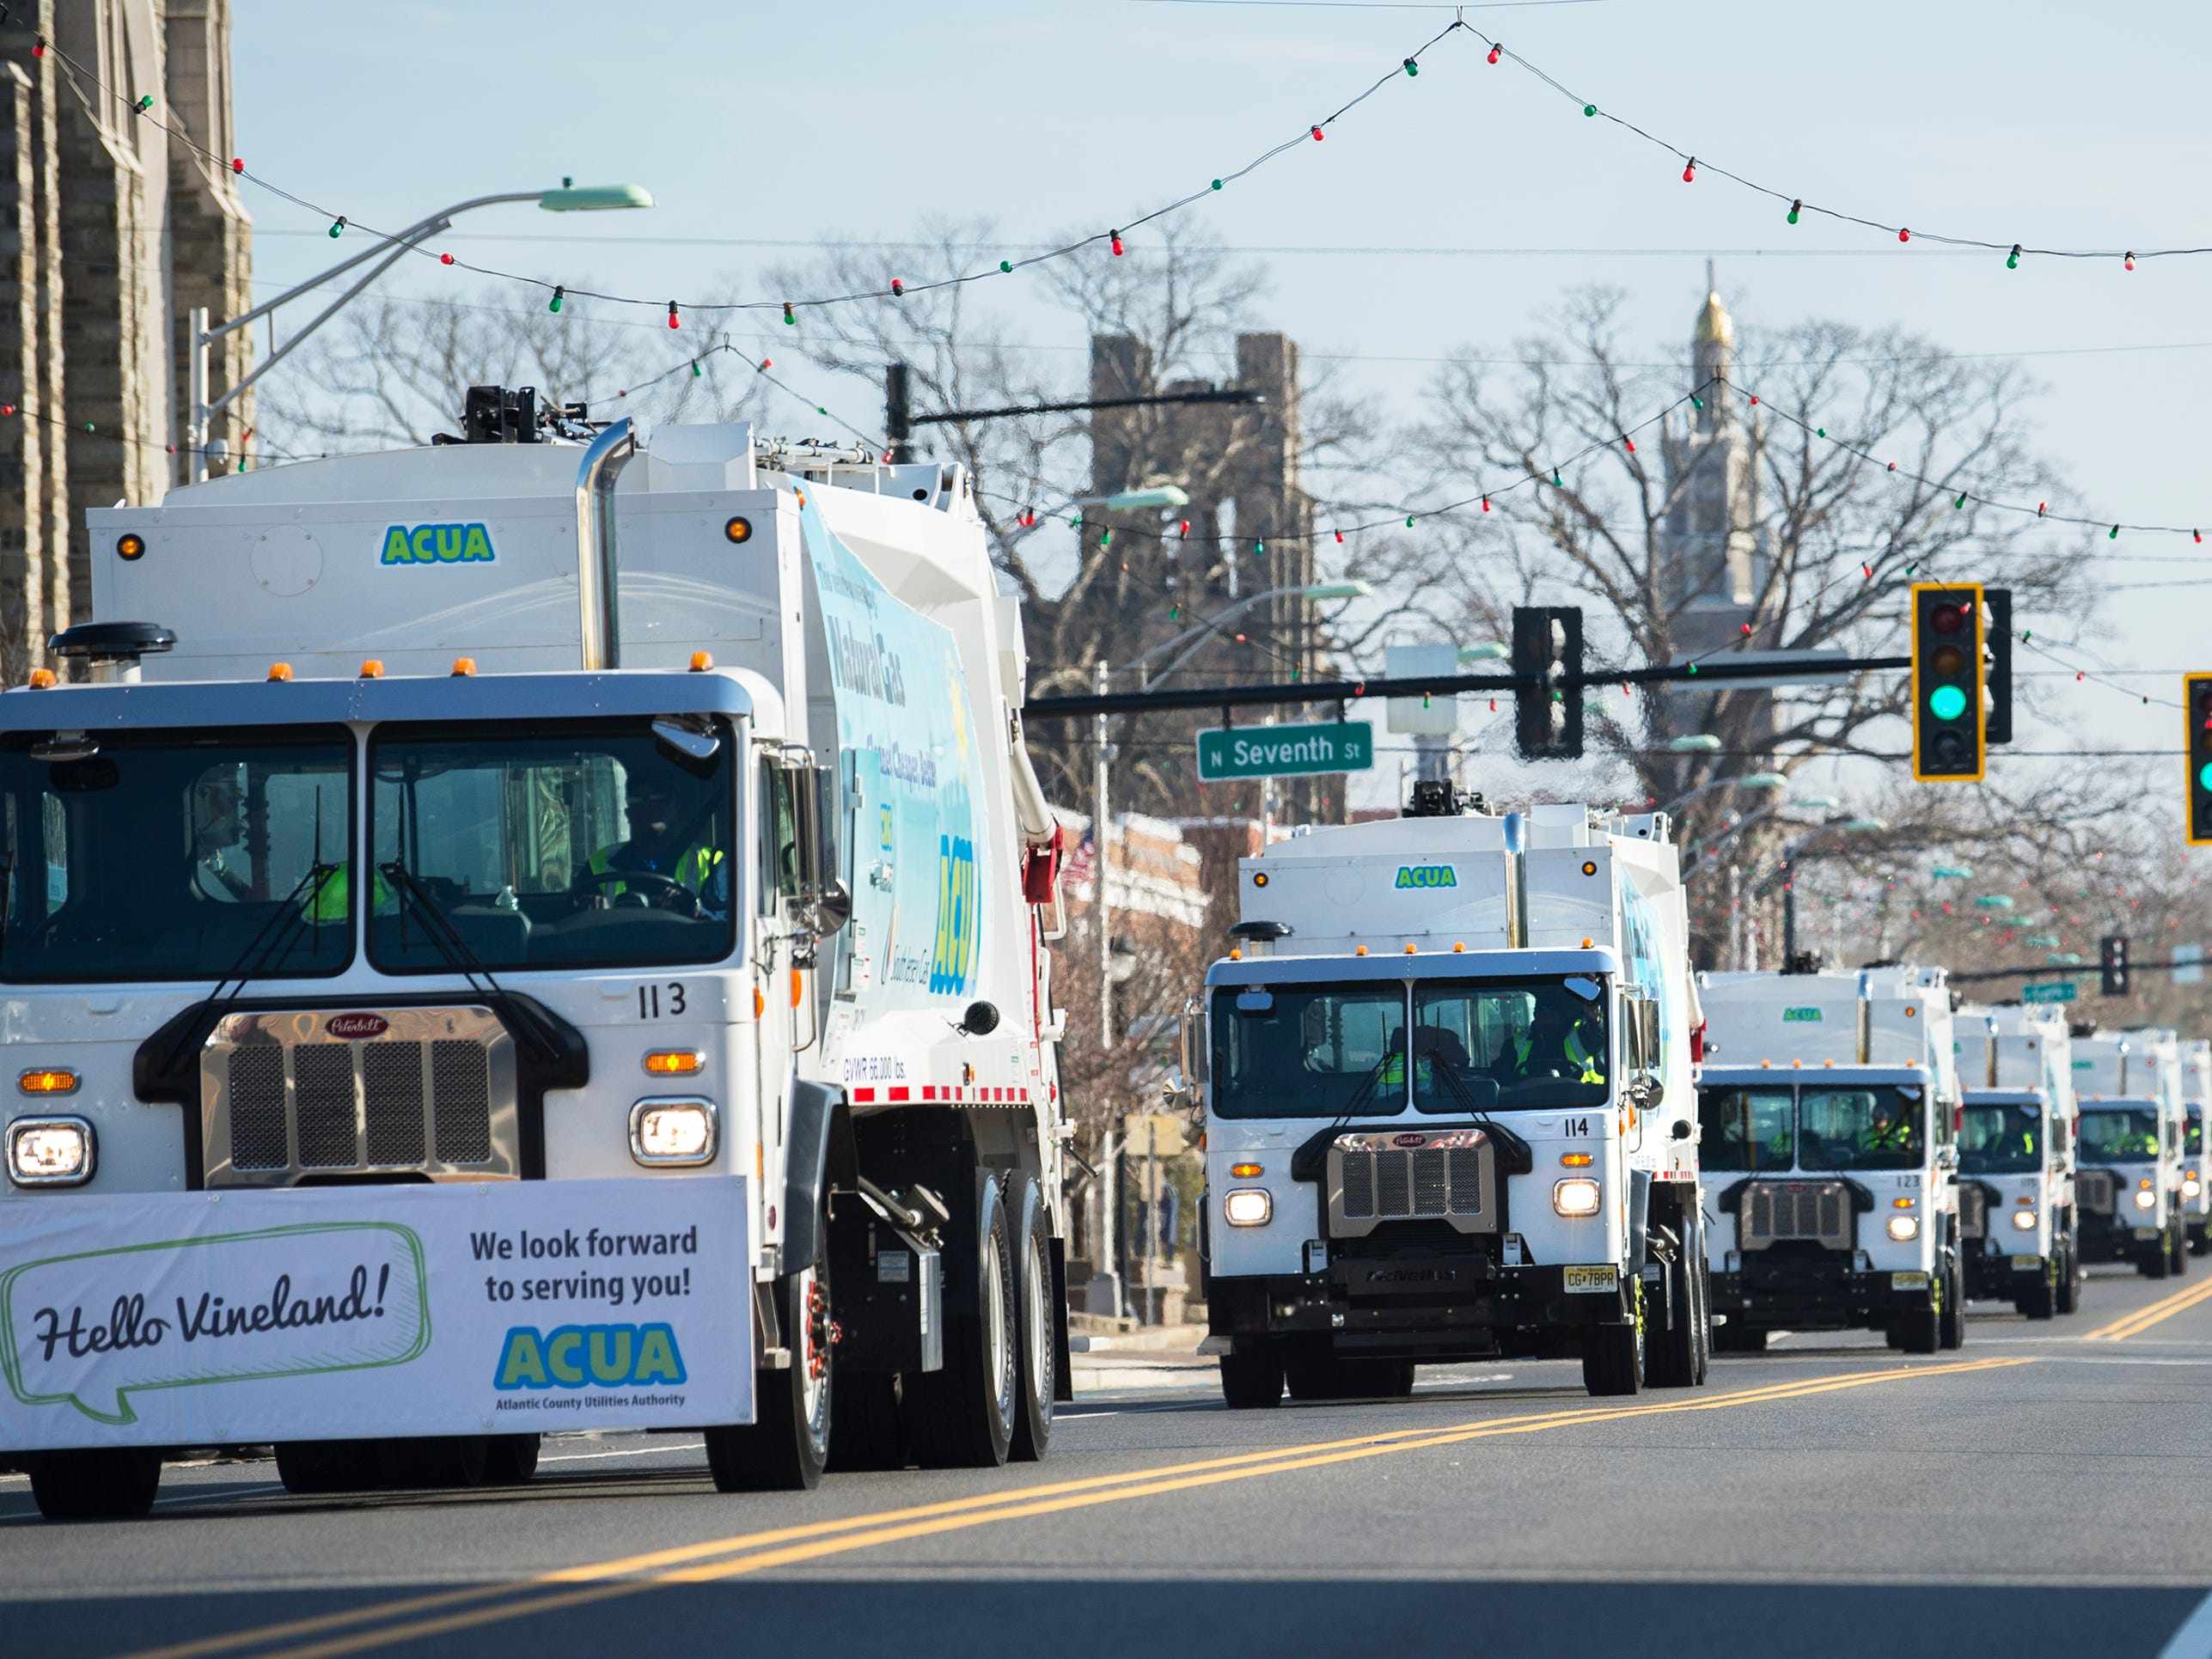 Vineland parades new fleet of trash collection vehicles